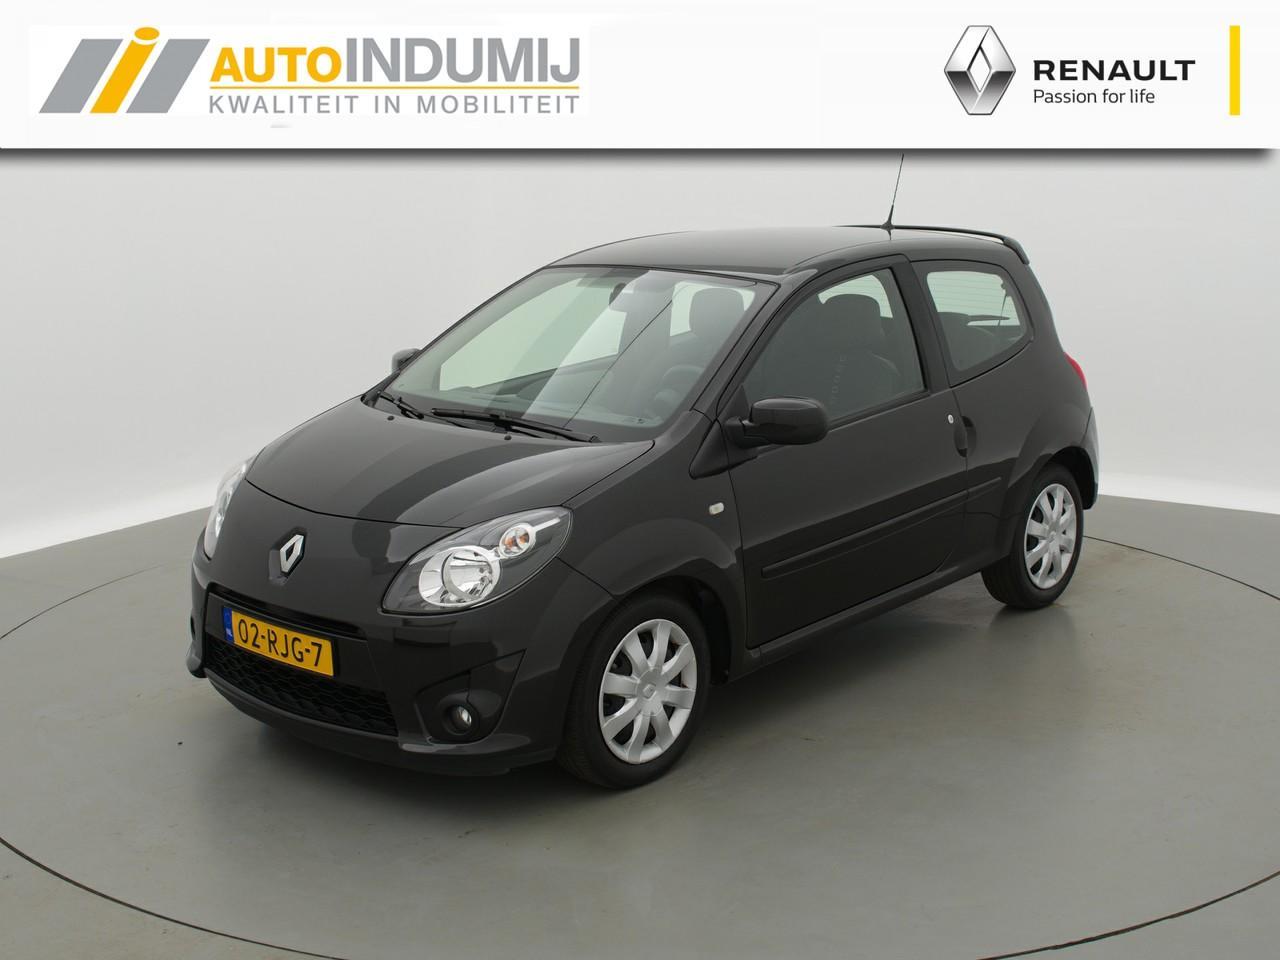 Renault Twingo 1.2-16v dynamique airco